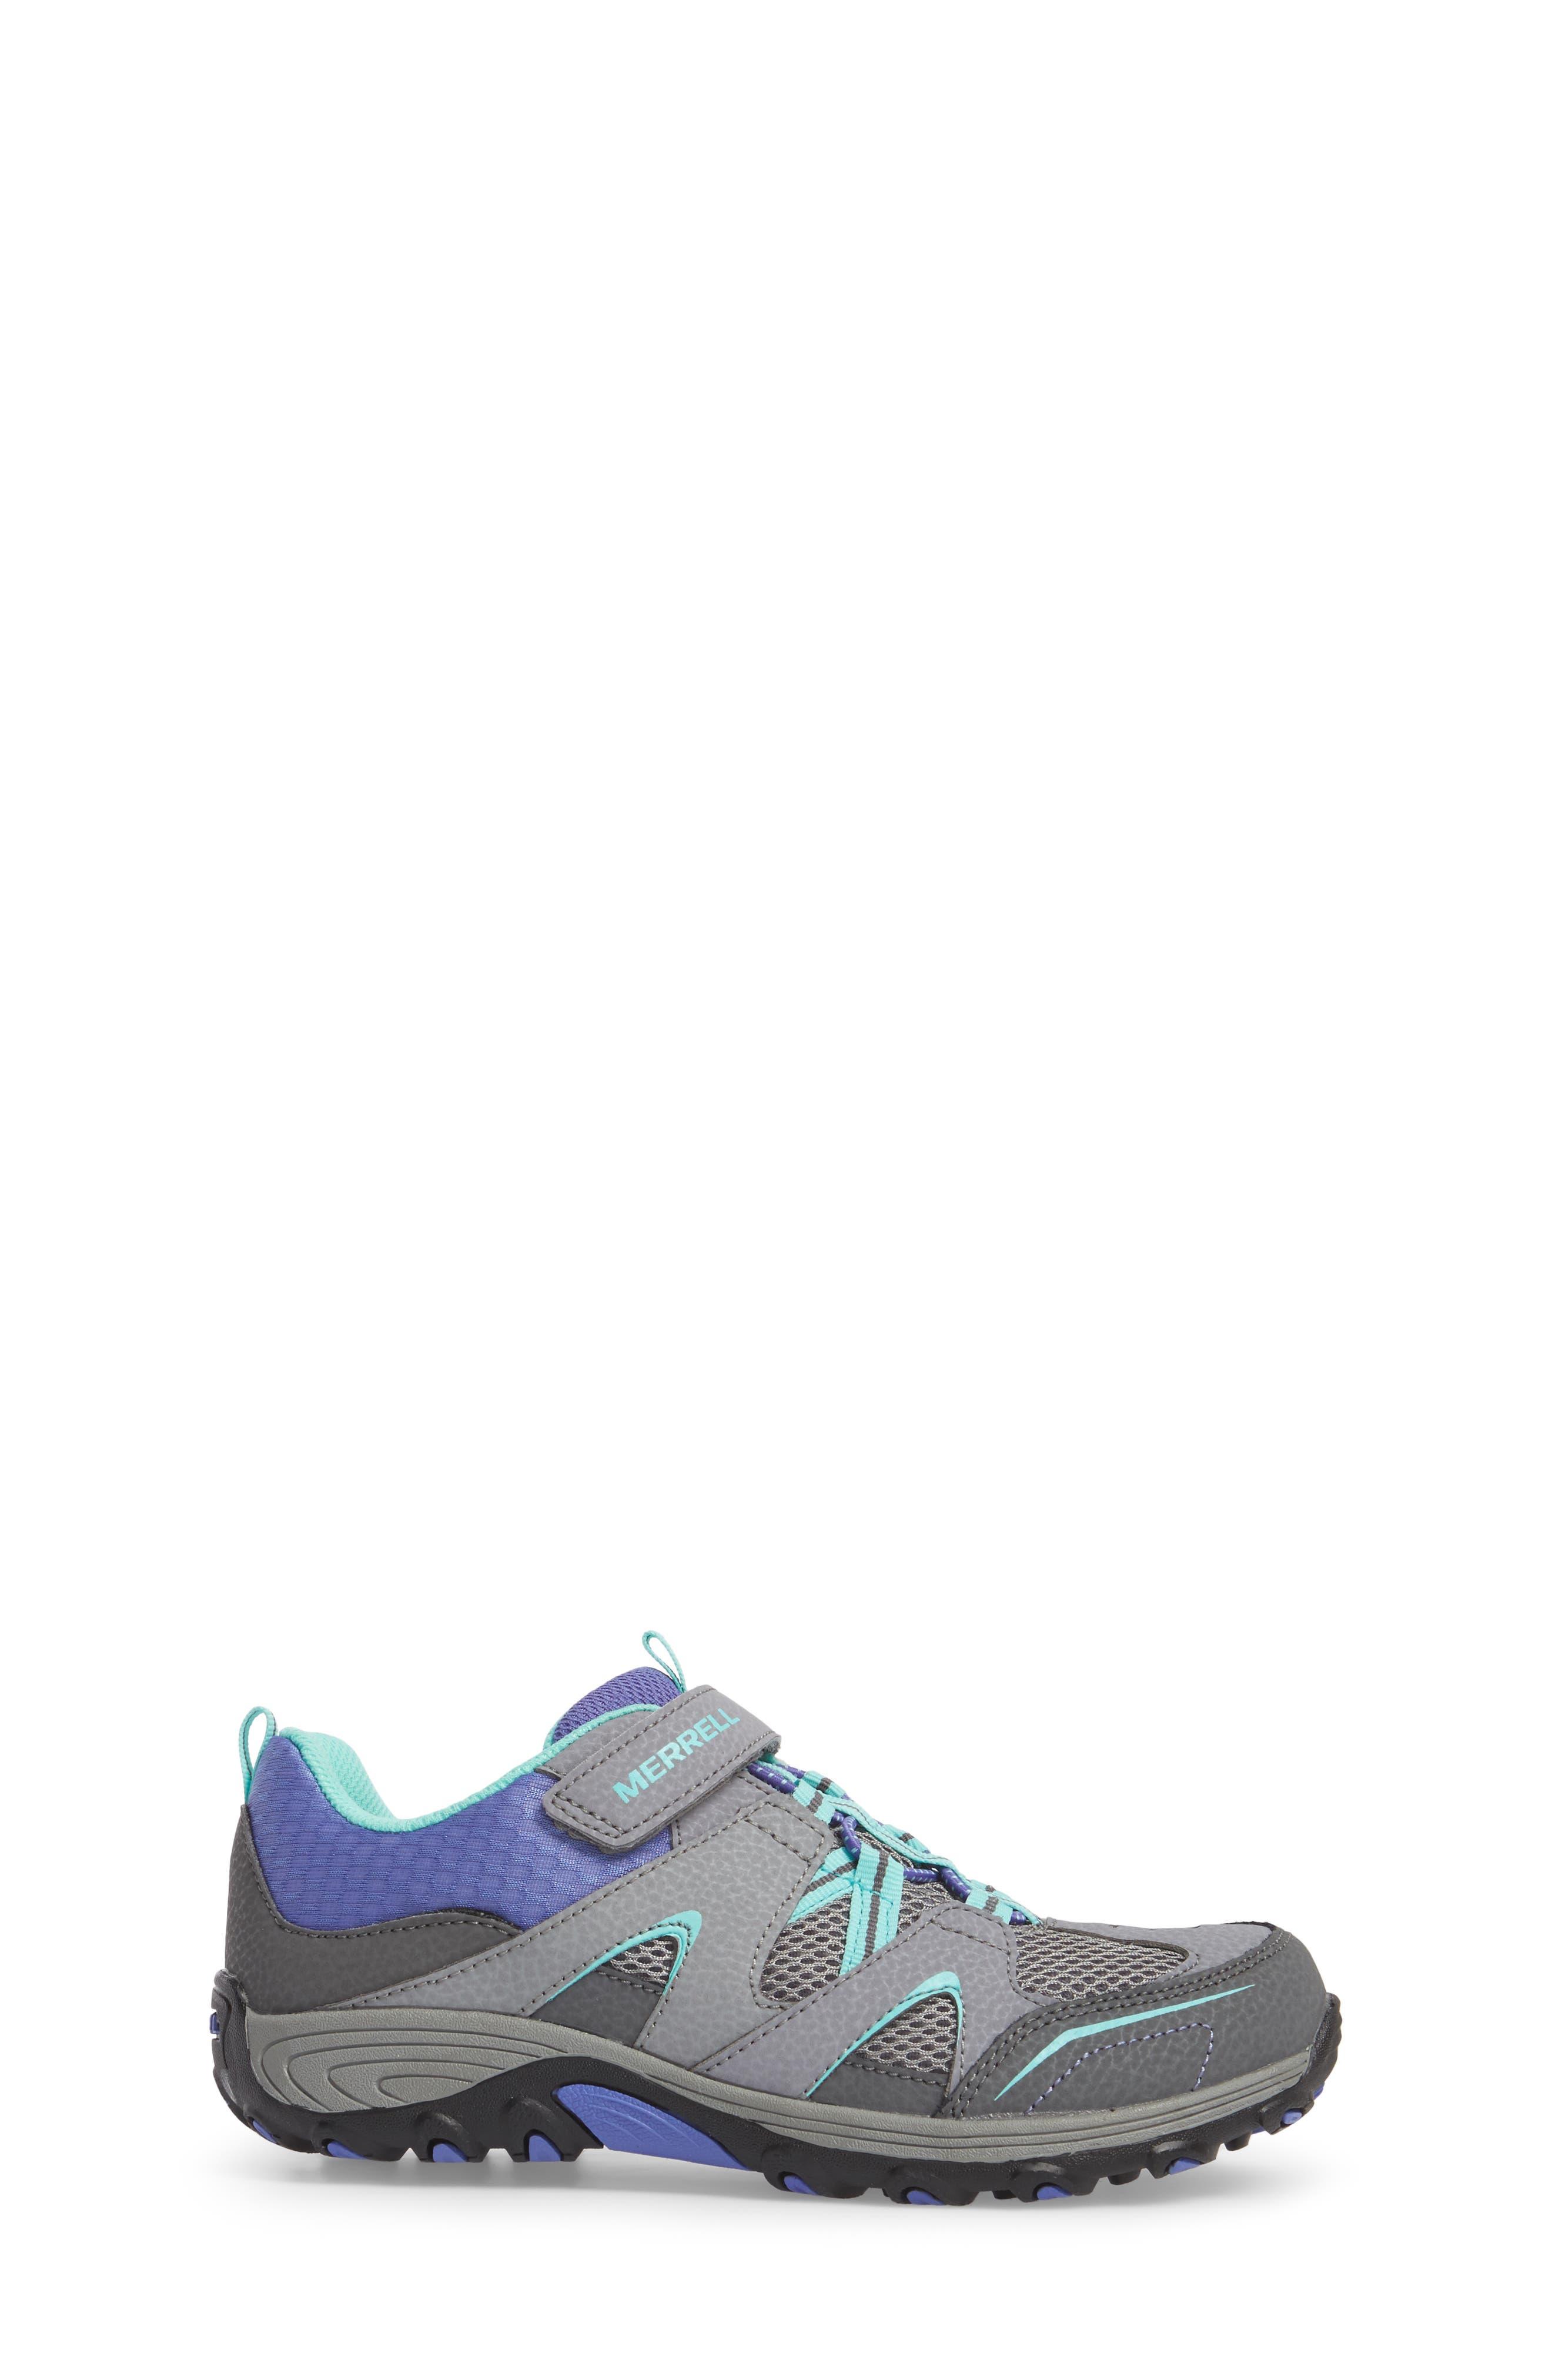 Trail Chaser Sneaker,                             Alternate thumbnail 3, color,                             GREY/ MULTI